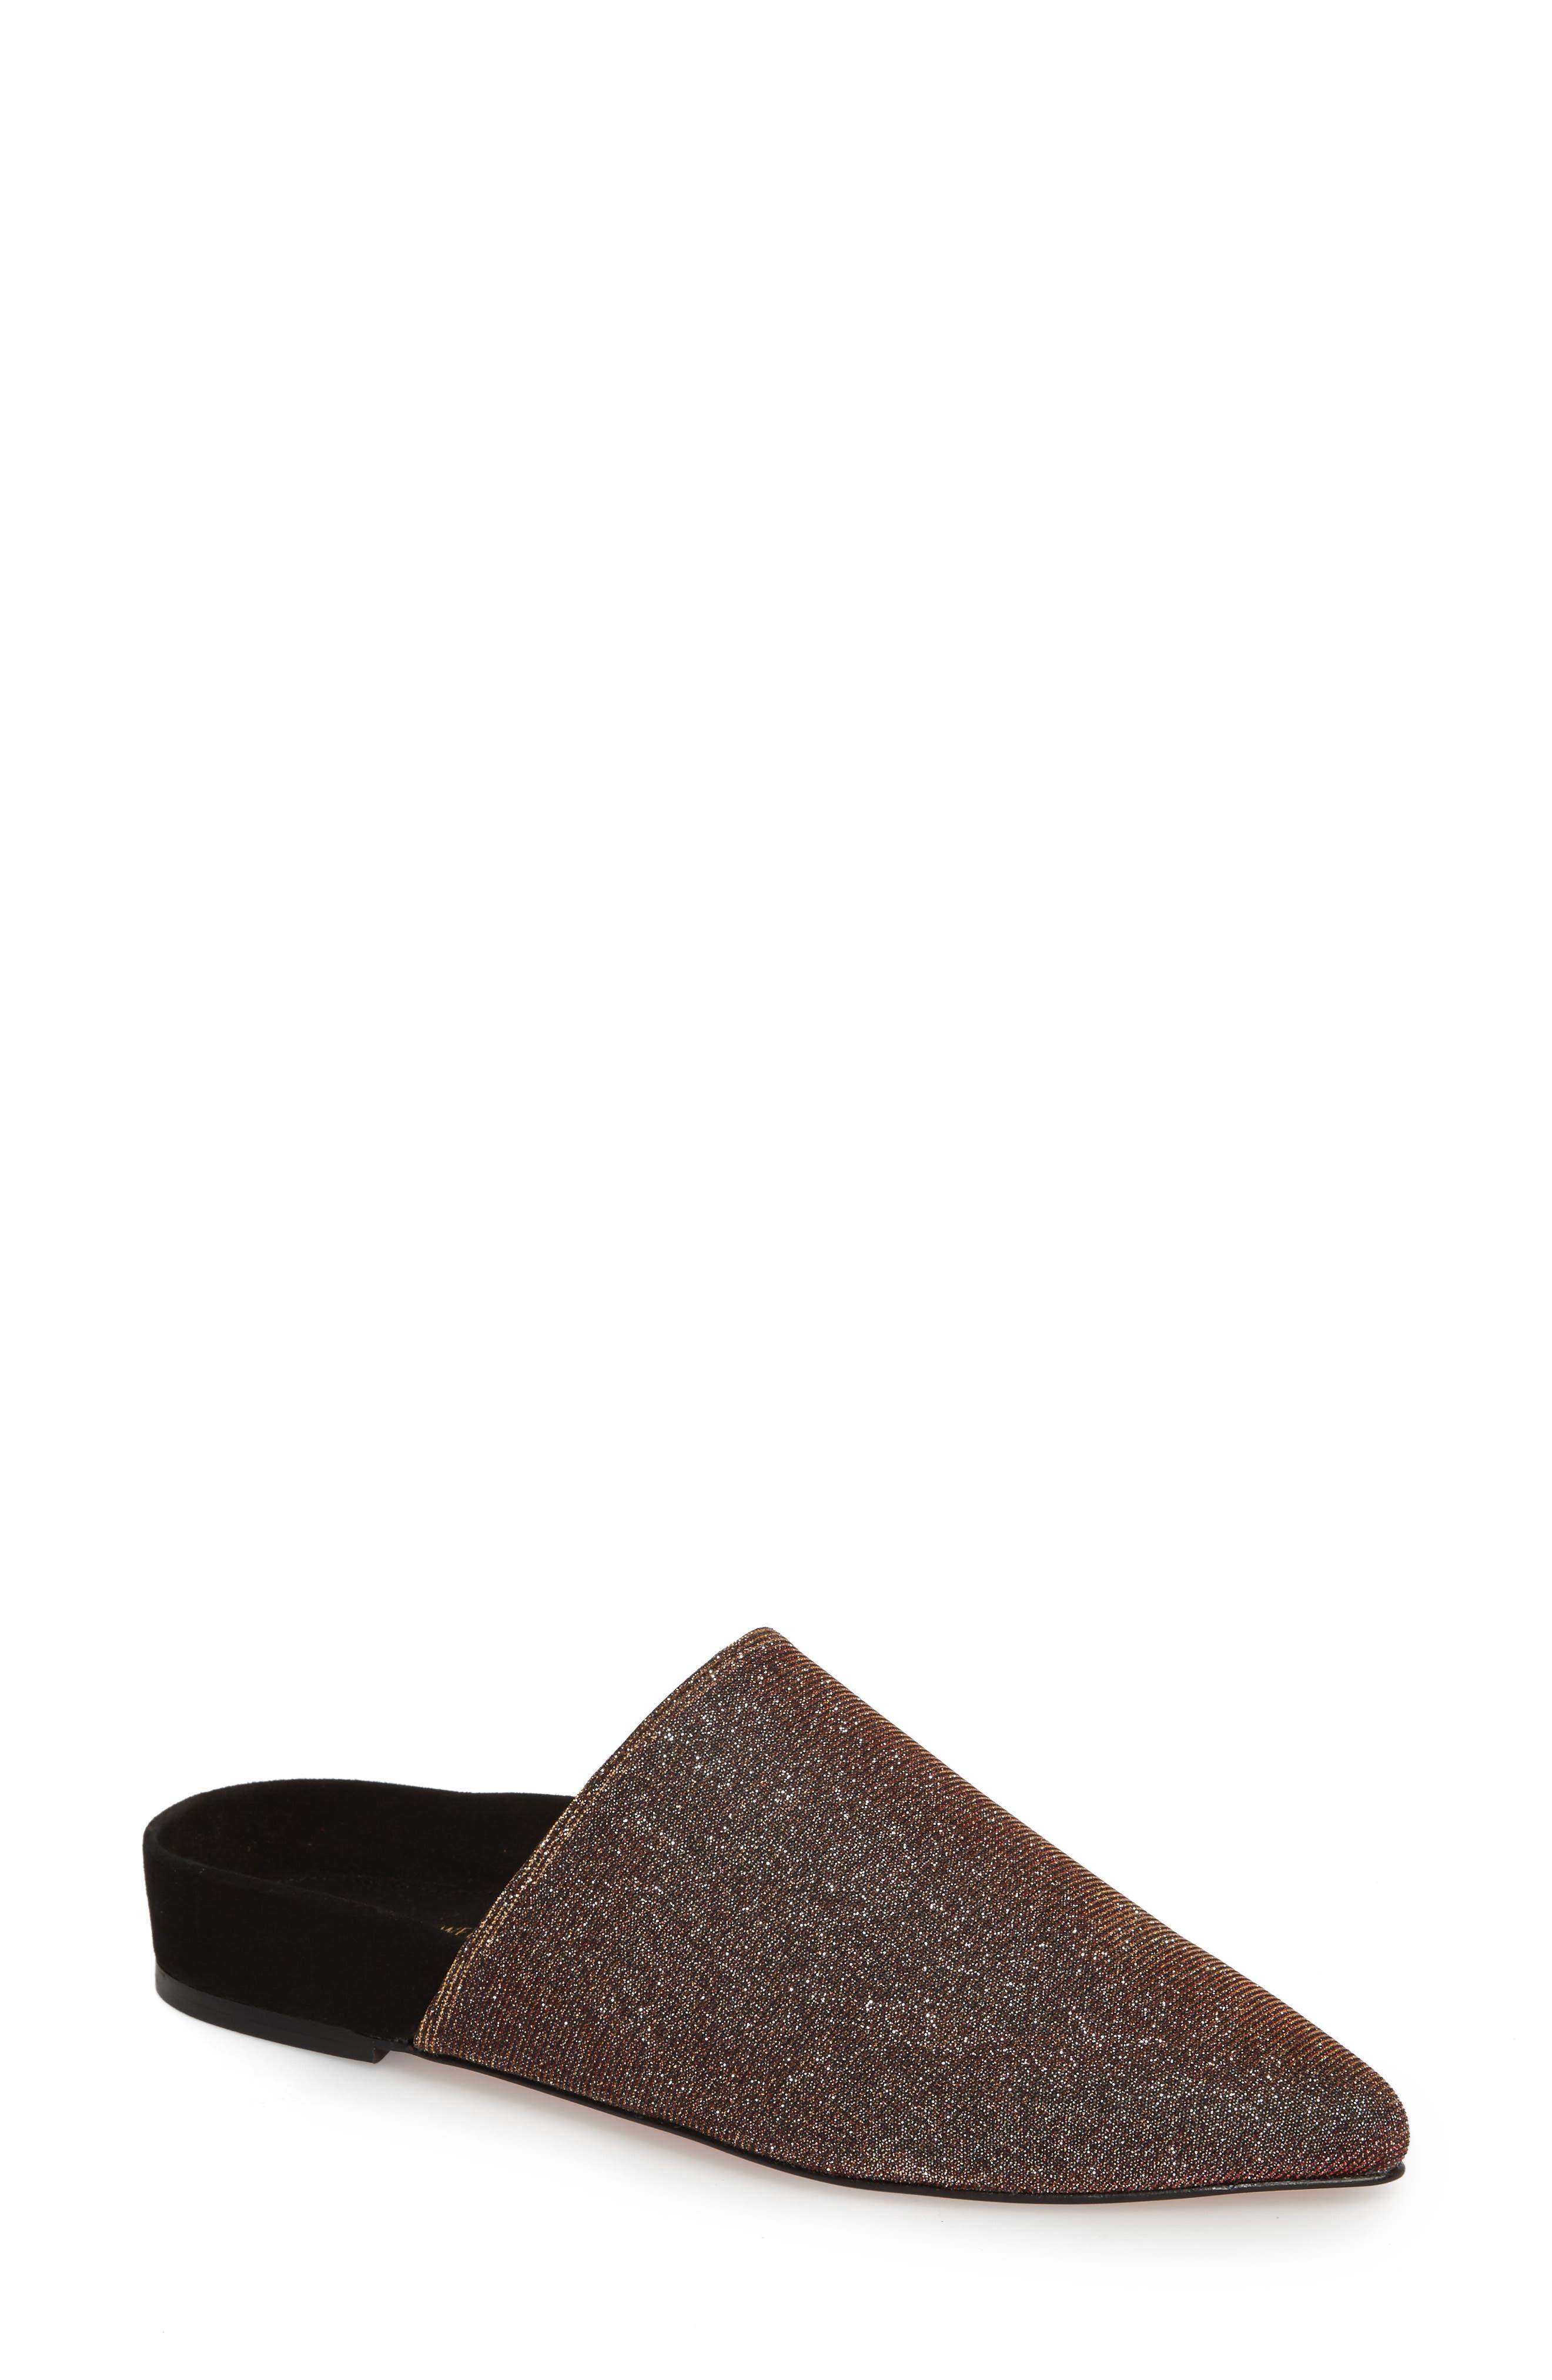 Stuart Weitzman Studio Pointy Toe Flat Mule (Women)